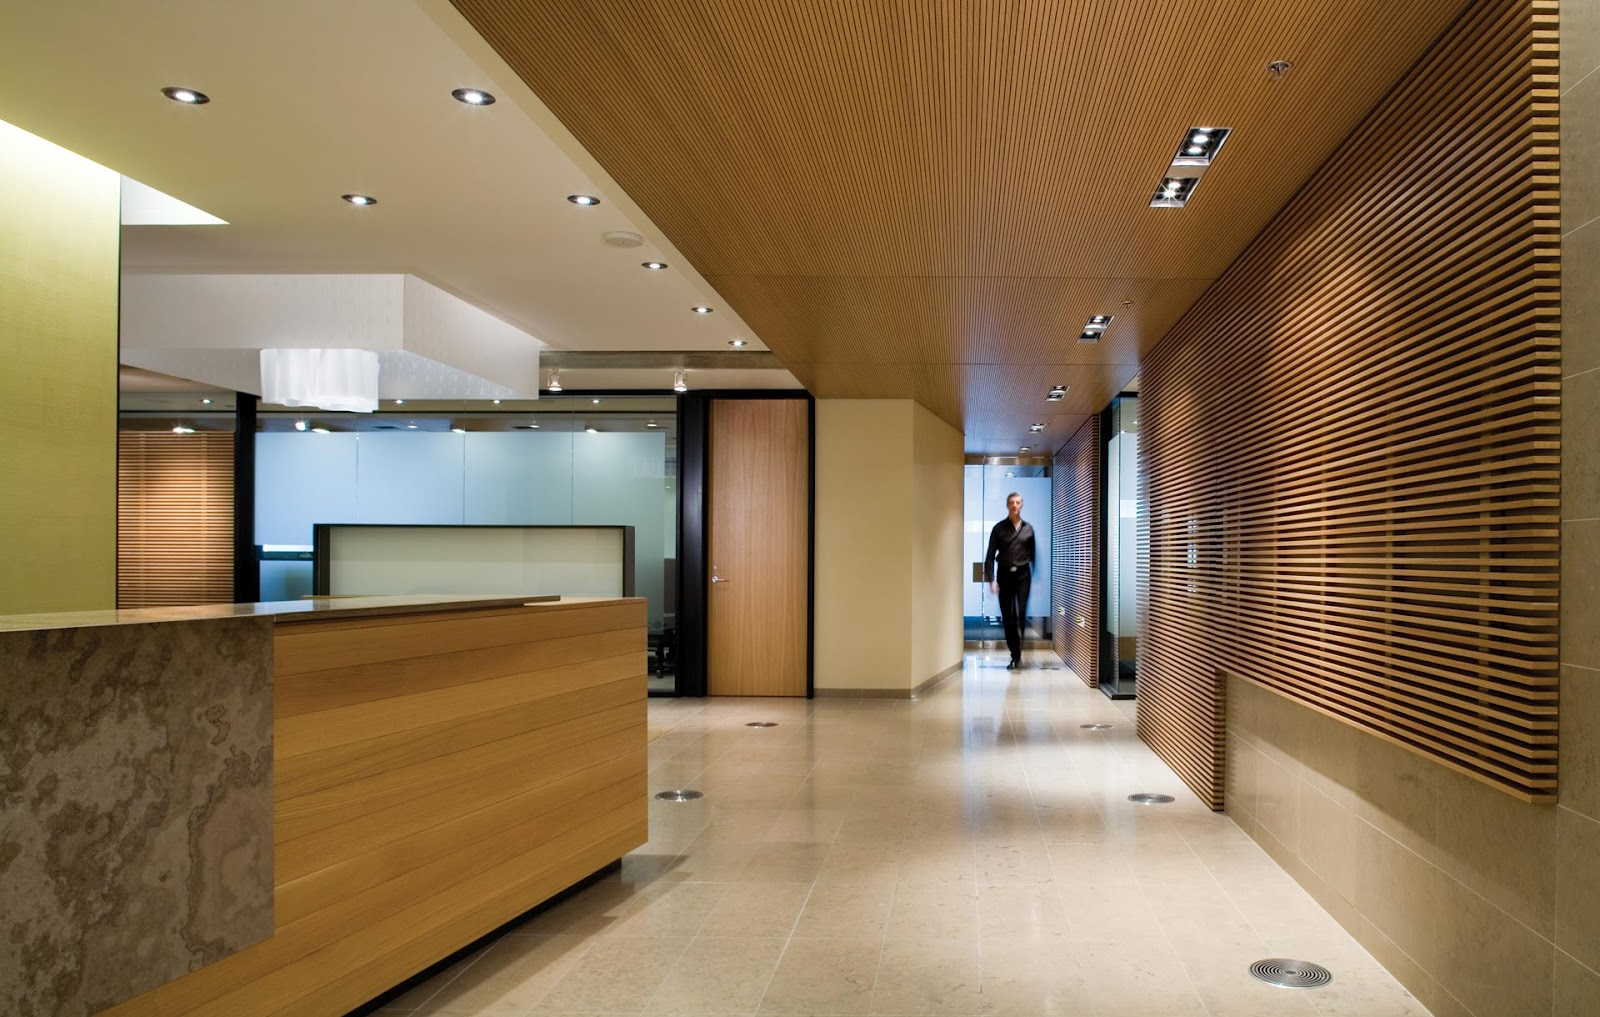 imagine these corporate office interior design aquilon. Black Bedroom Furniture Sets. Home Design Ideas